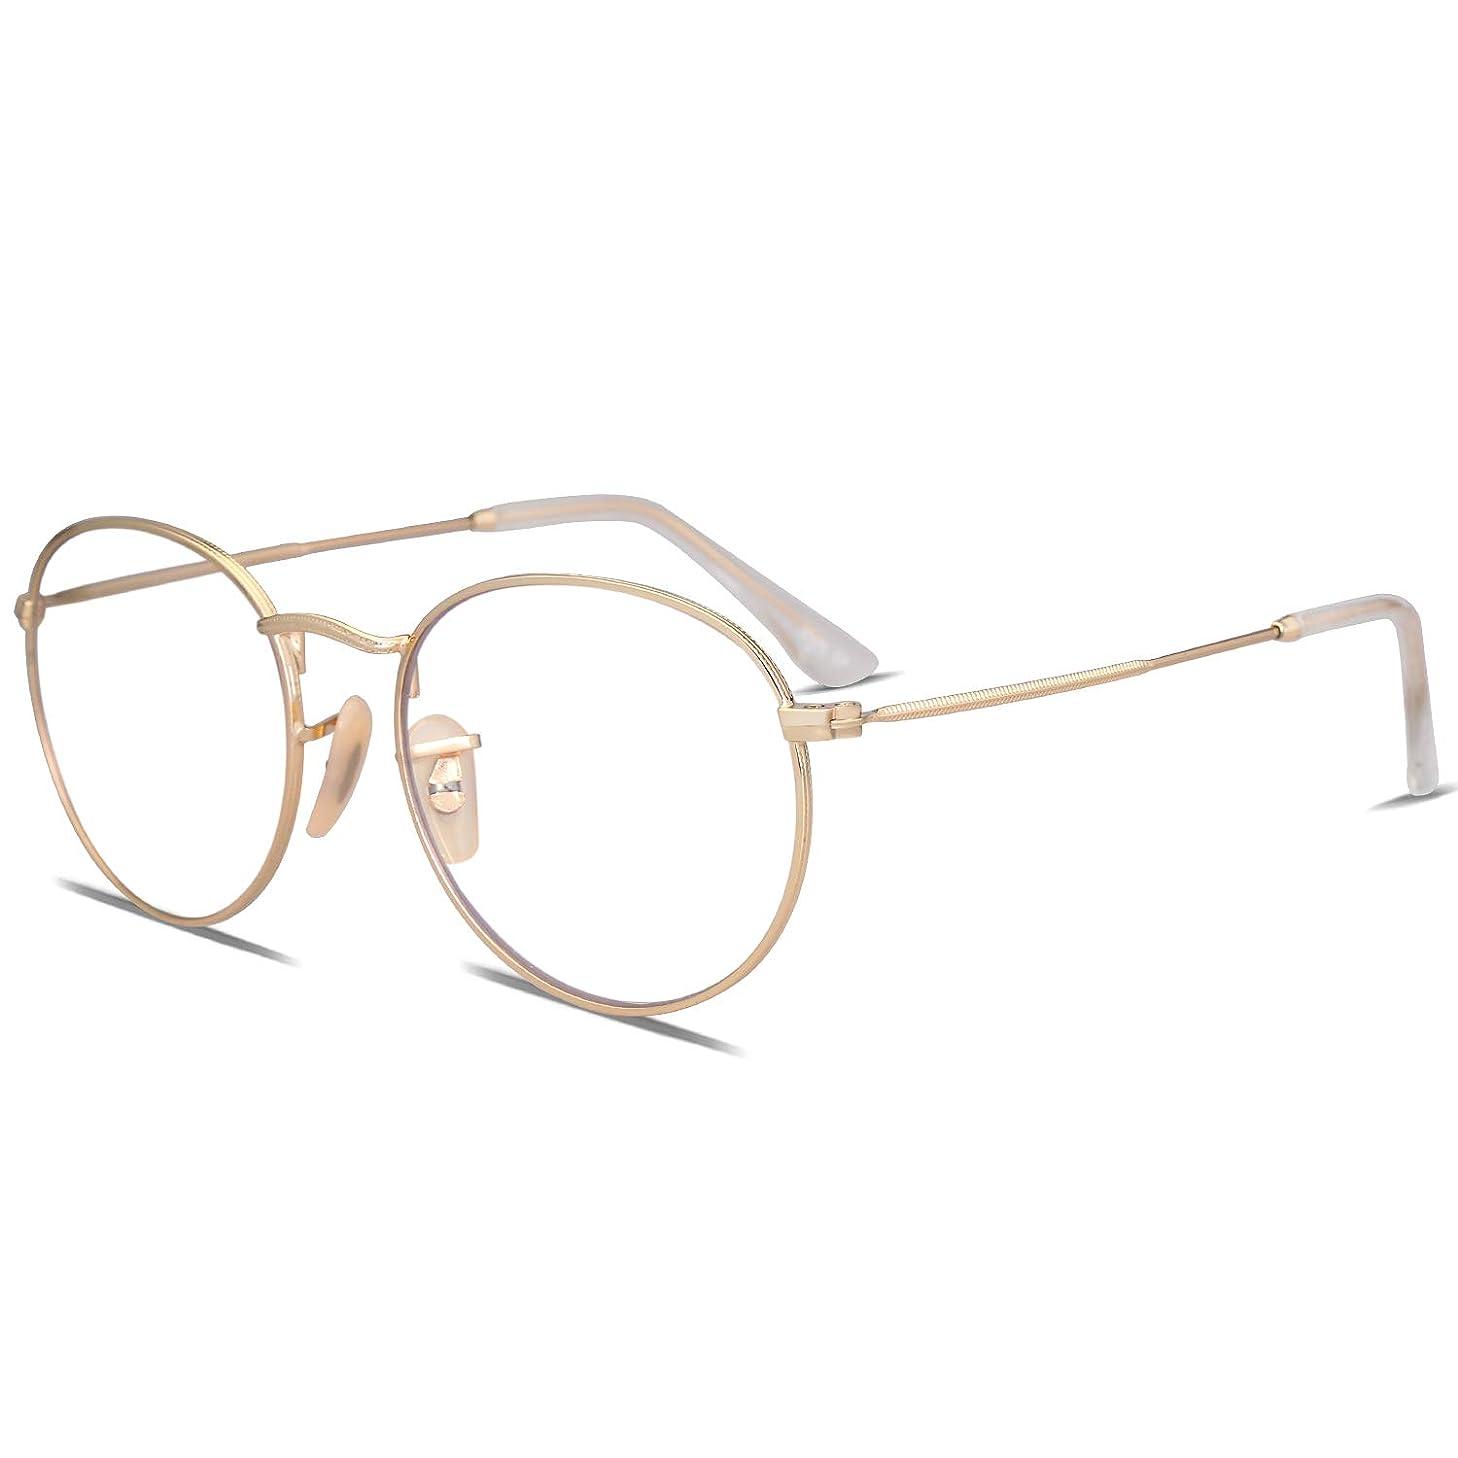 SOJOS Blue Light Blocking Glasses Round Eyeglasses Frame Anti Blue Ray Computer Game Glasses SJ5024